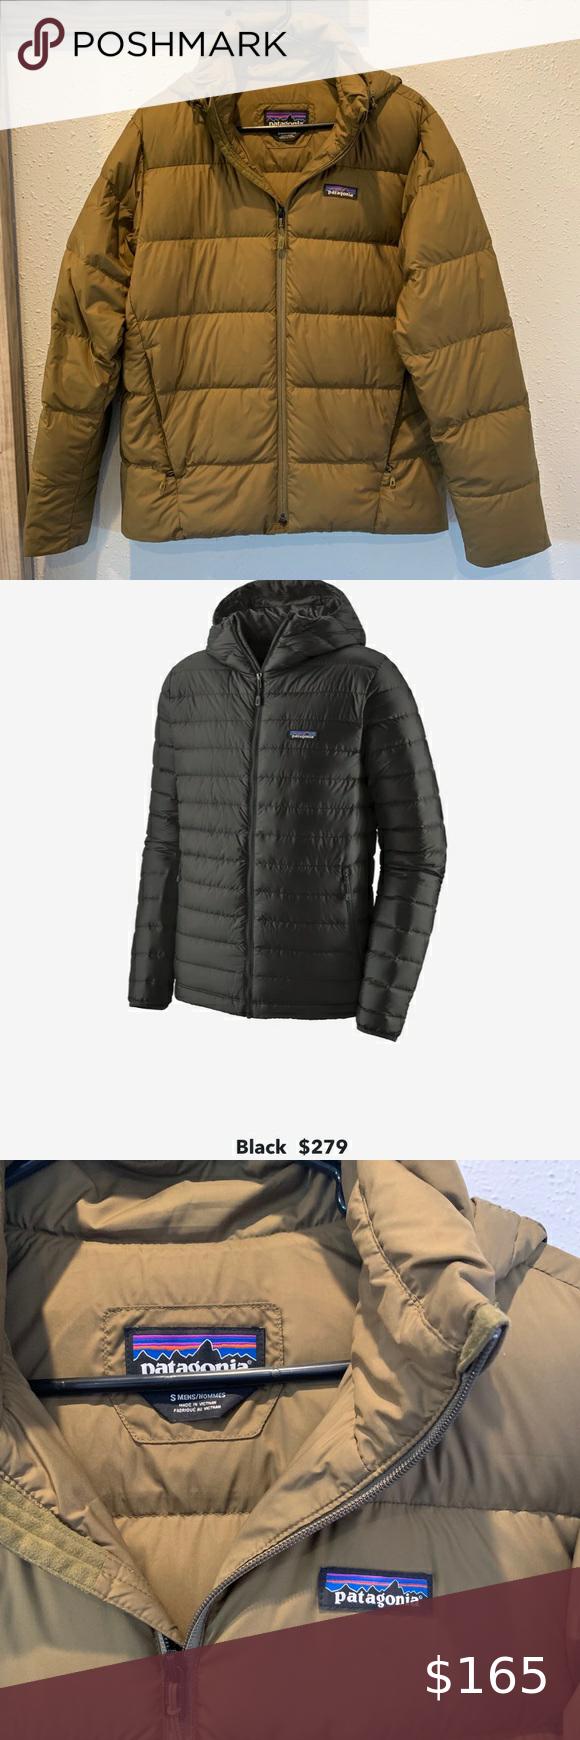 Patagonia Down Sweater Hoody In 2020 Patagonia Down Sweater Patagonia Down Sweater Hoody Black Patagonia Jacket [ 1740 x 580 Pixel ]